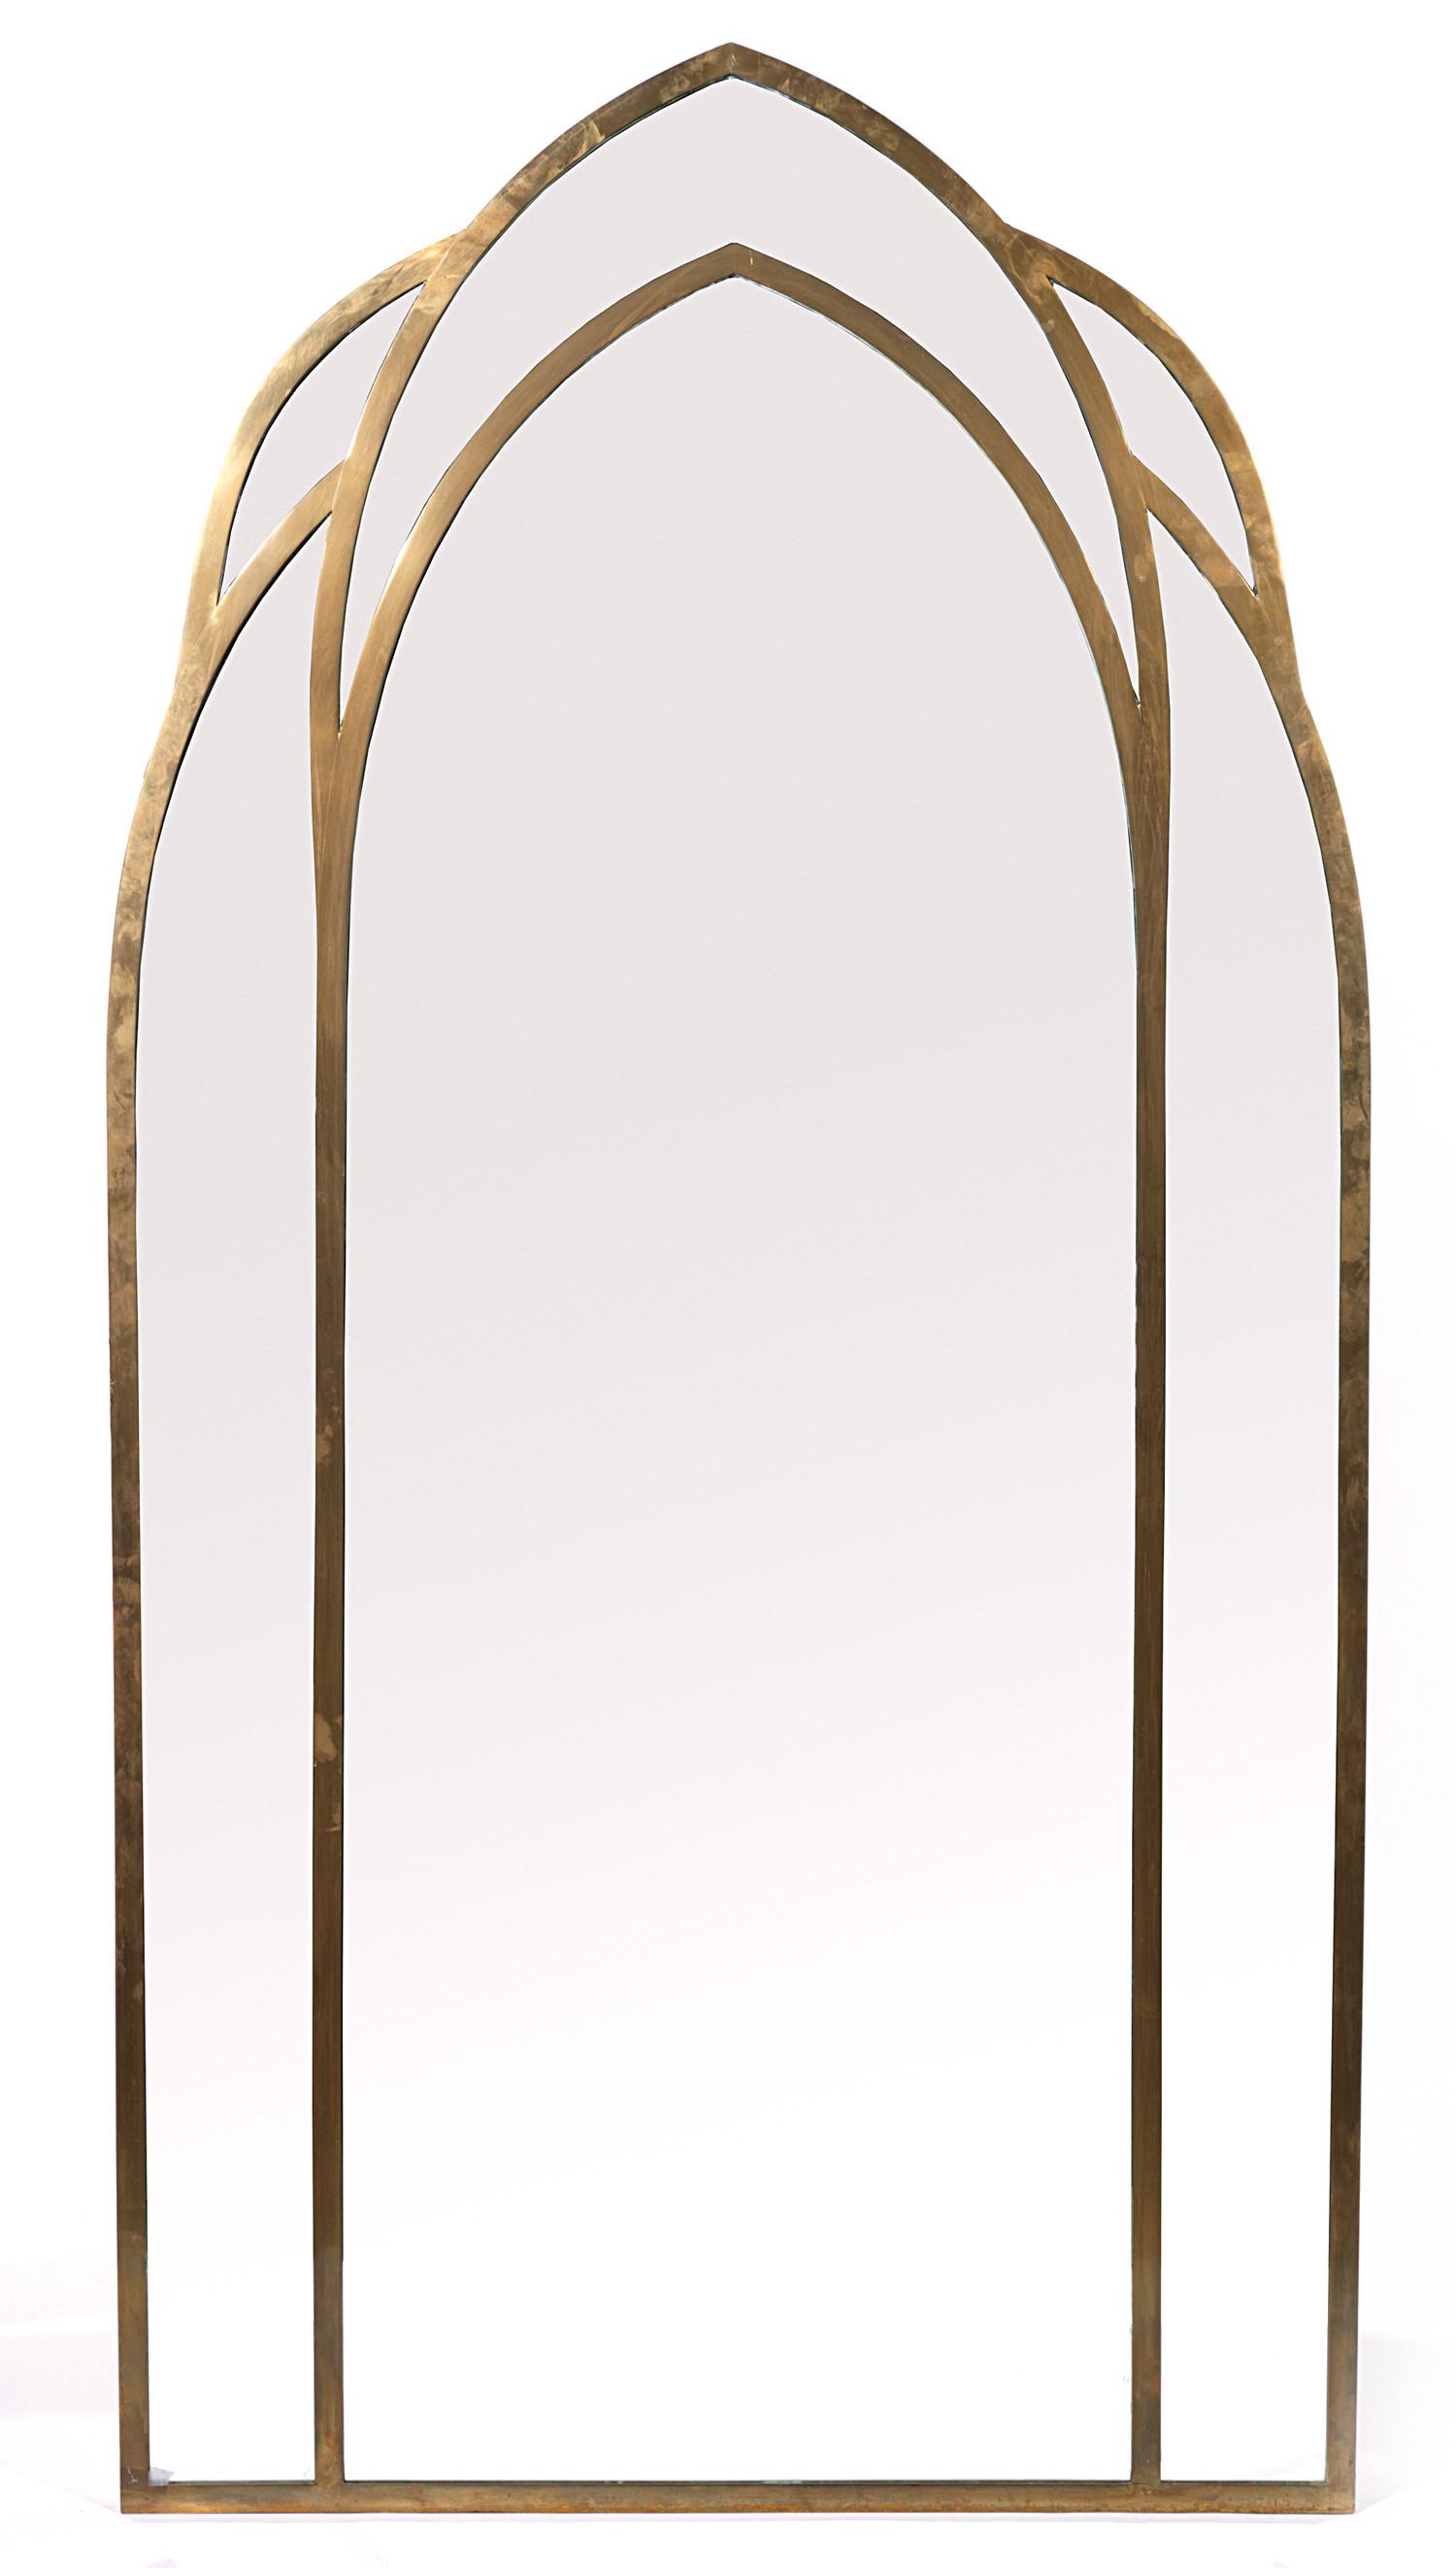 Gabriella Crespi, Cathedral Mirror, c.1970,  Tajan Paris